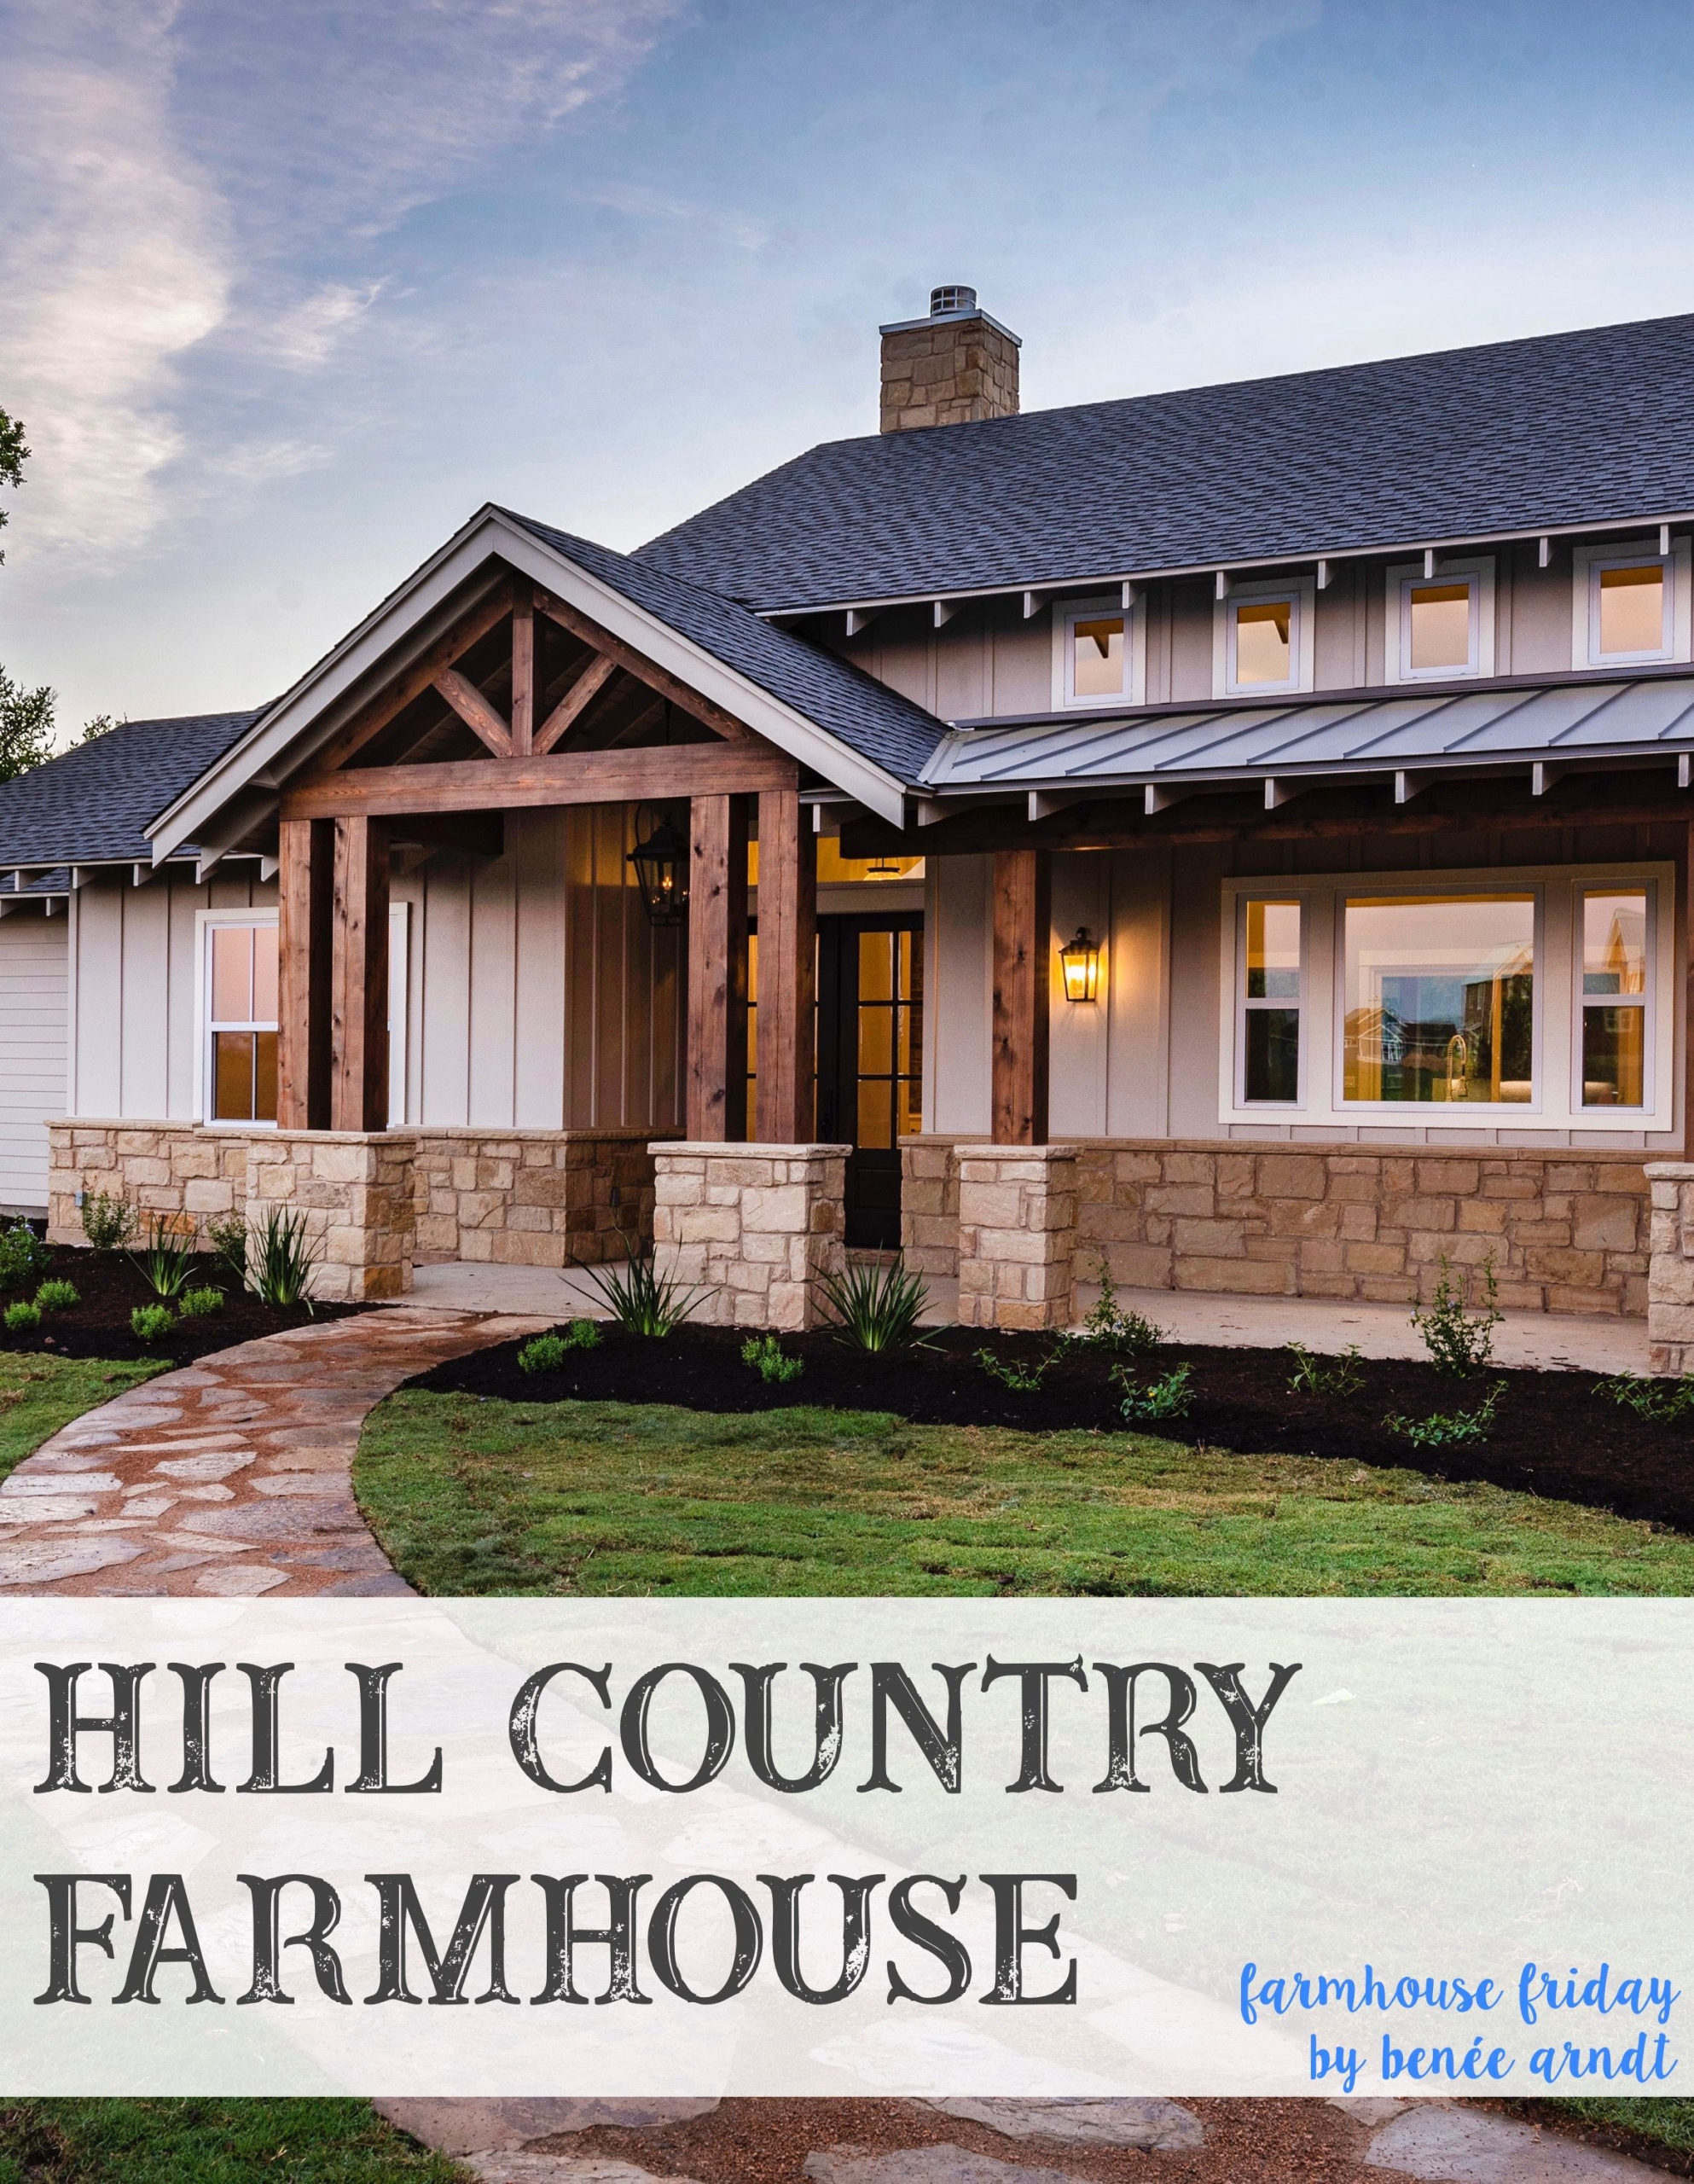 Luxury House Designs Exterior Farmhouse Country Beautiful Texas Hill Country Farmhouse In 2020 House Designs Exterior Country House Design Small House Design Exterior